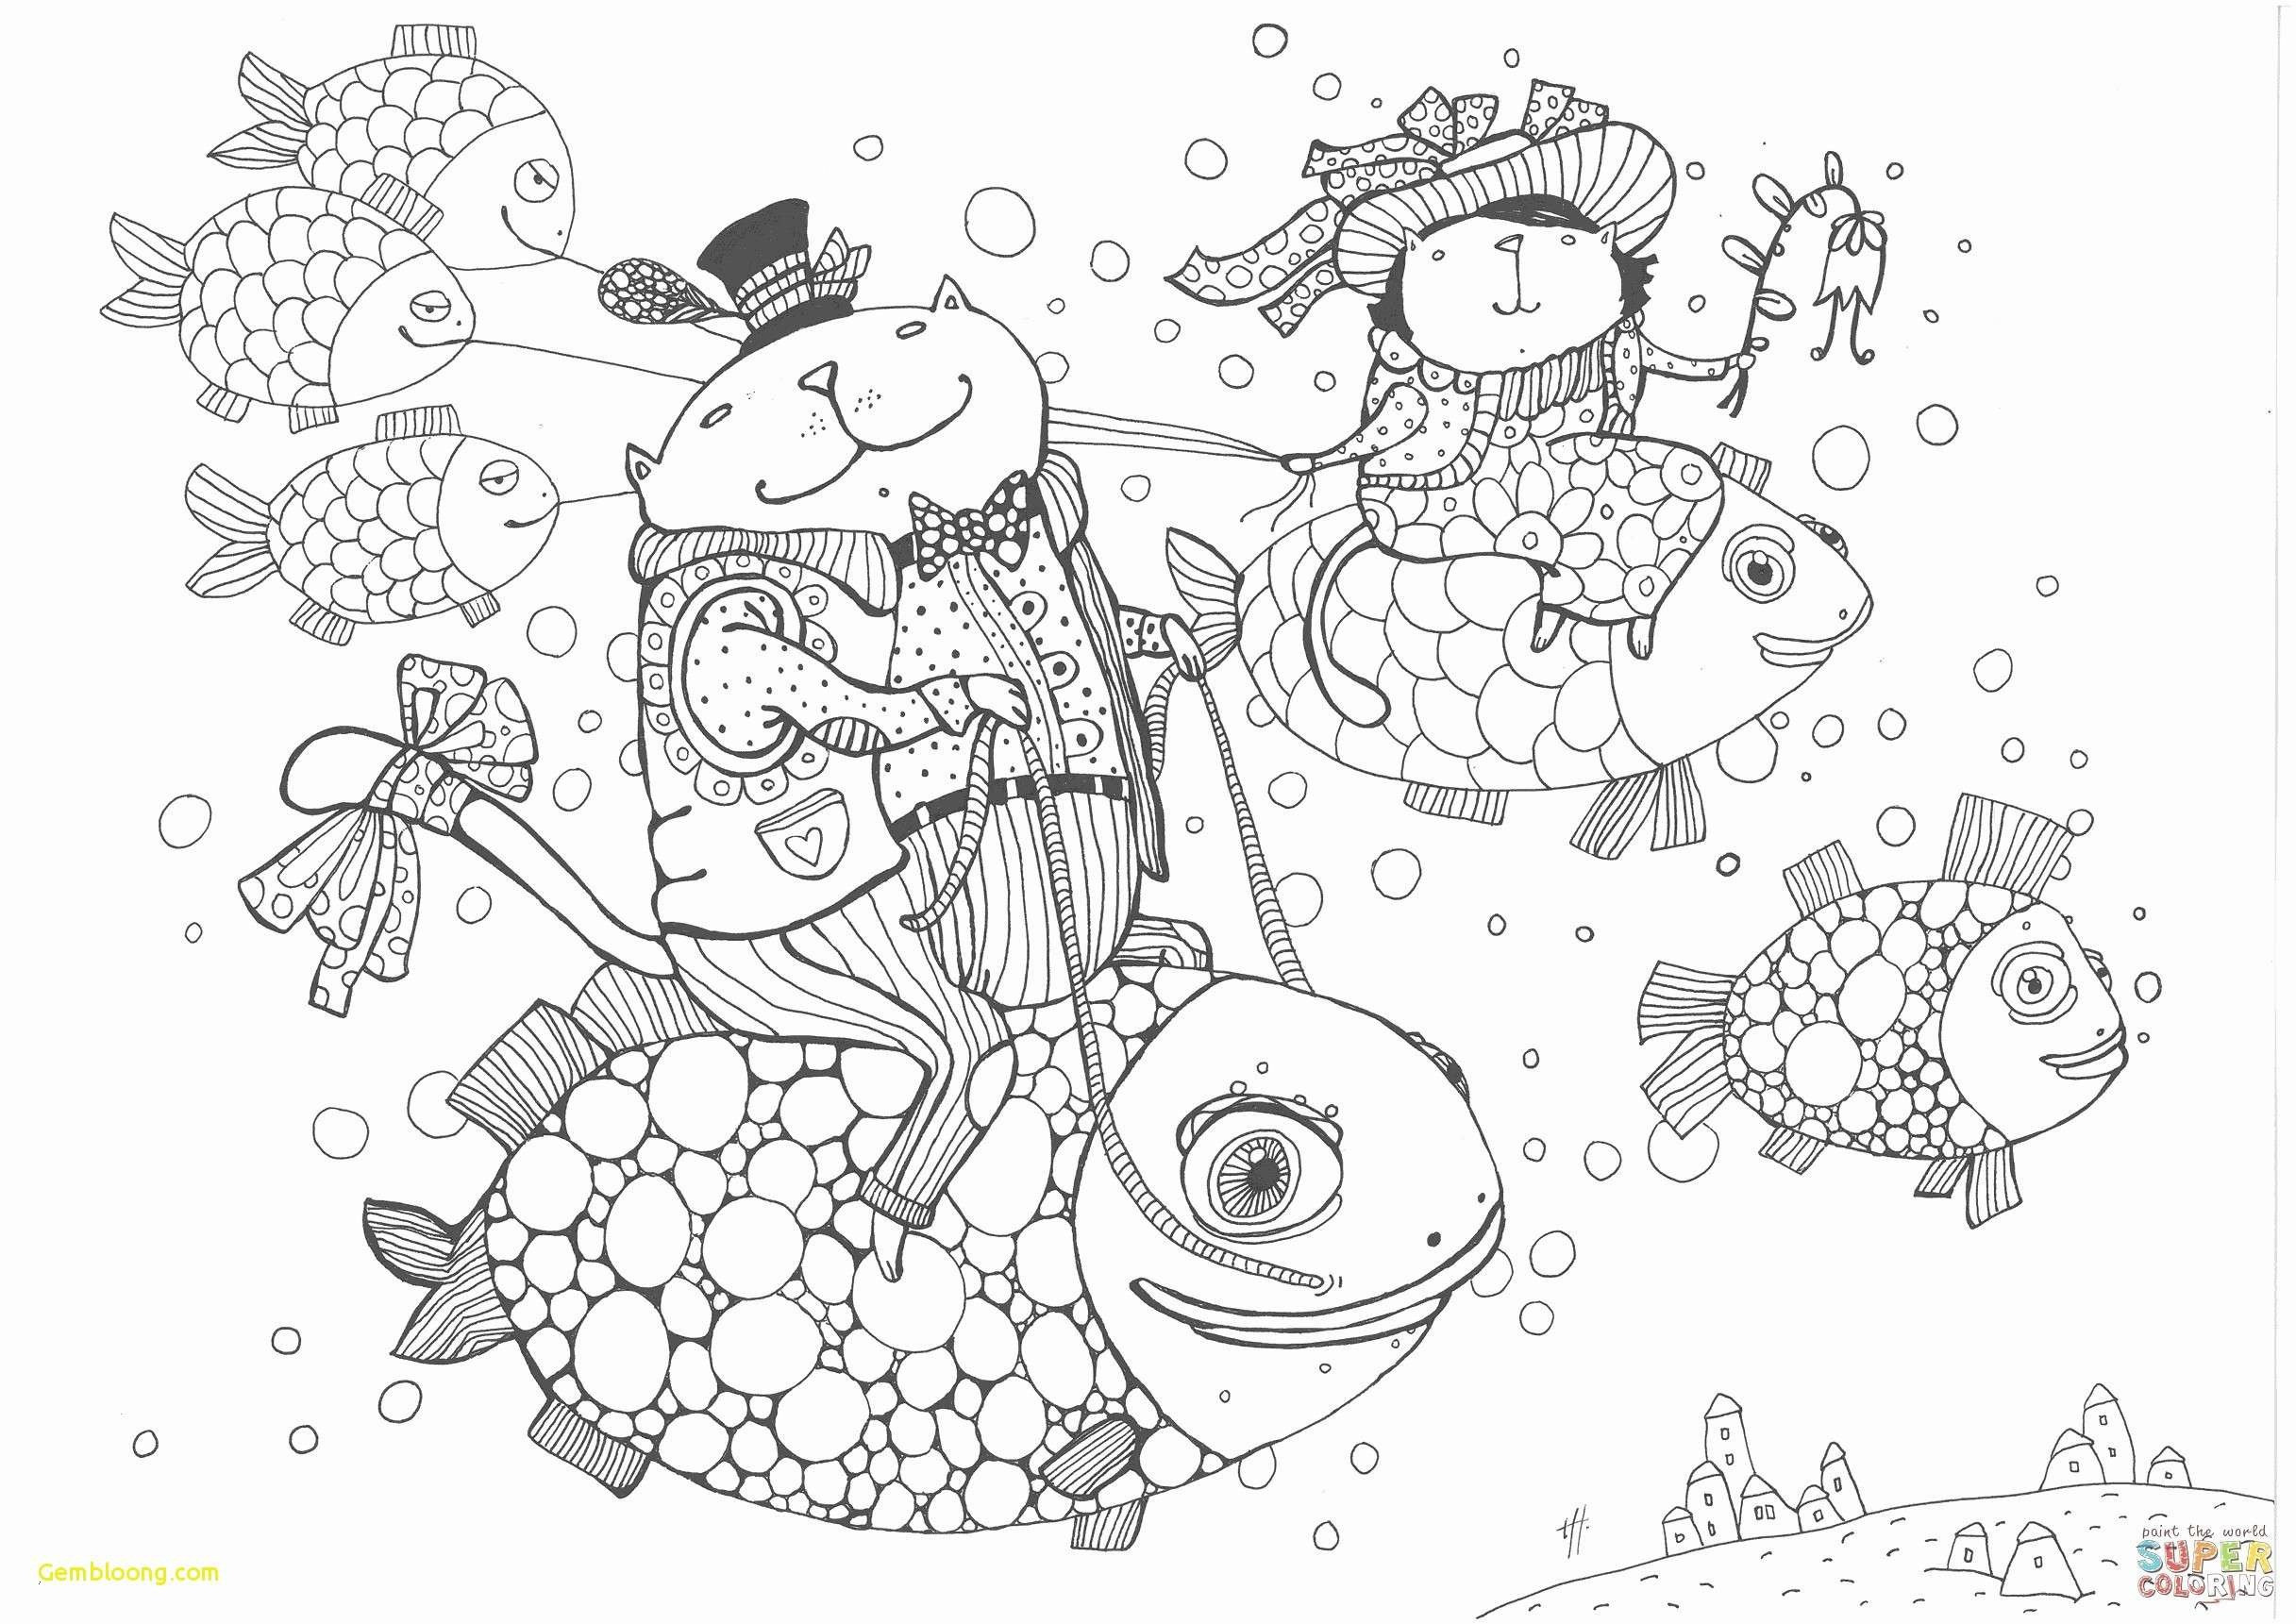 Ausmalbilder topmodel Meerjungfrau Genial 40 Ausmalbilder Wald Mit Tieren Scoredatscore Frisch topmodel Galerie